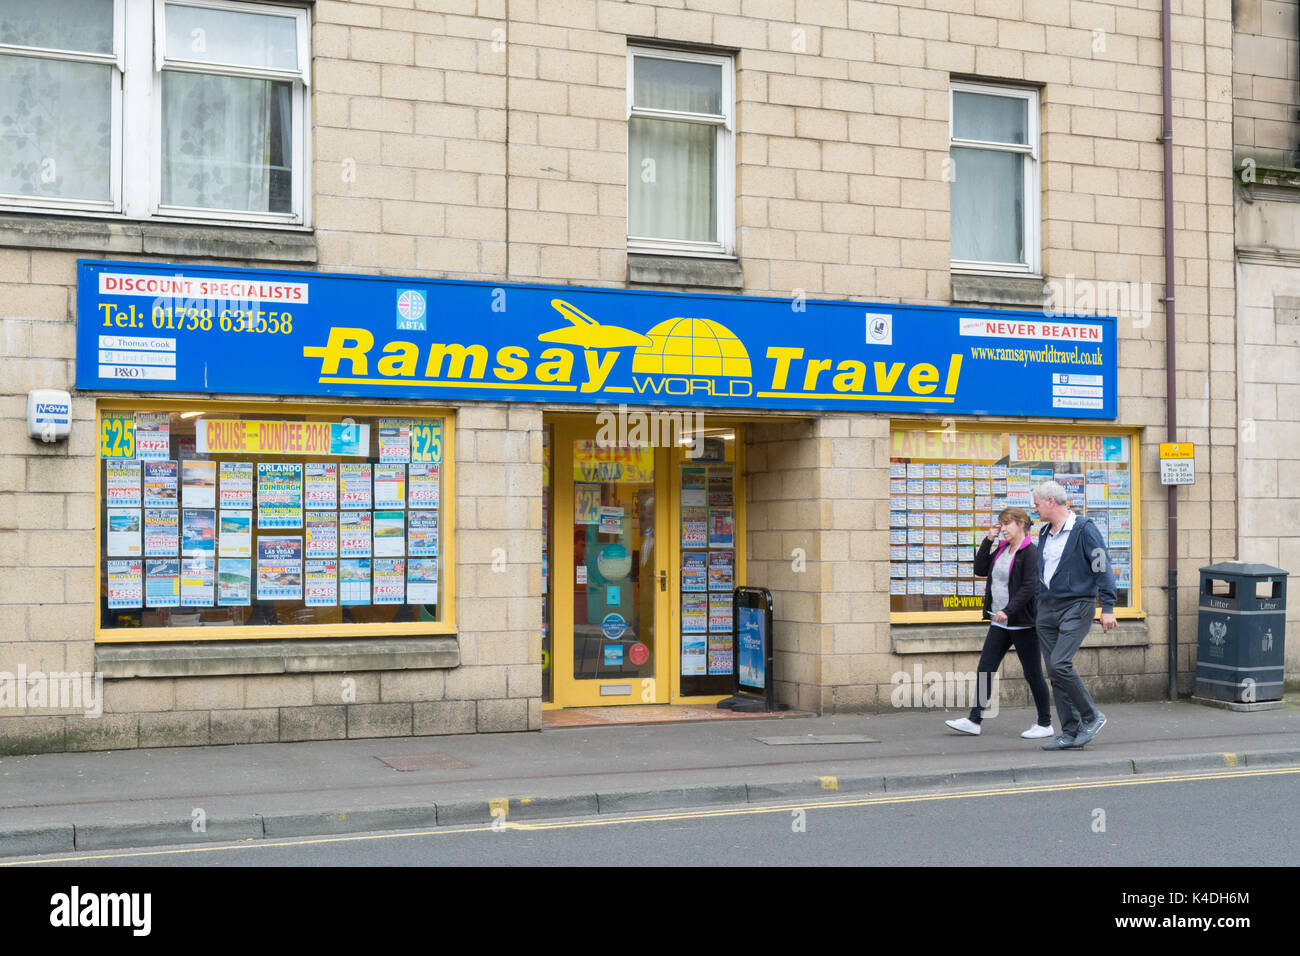 Unabhängige High Street Reisebüro Agentur, Perth, Schottland, UK Stockbild